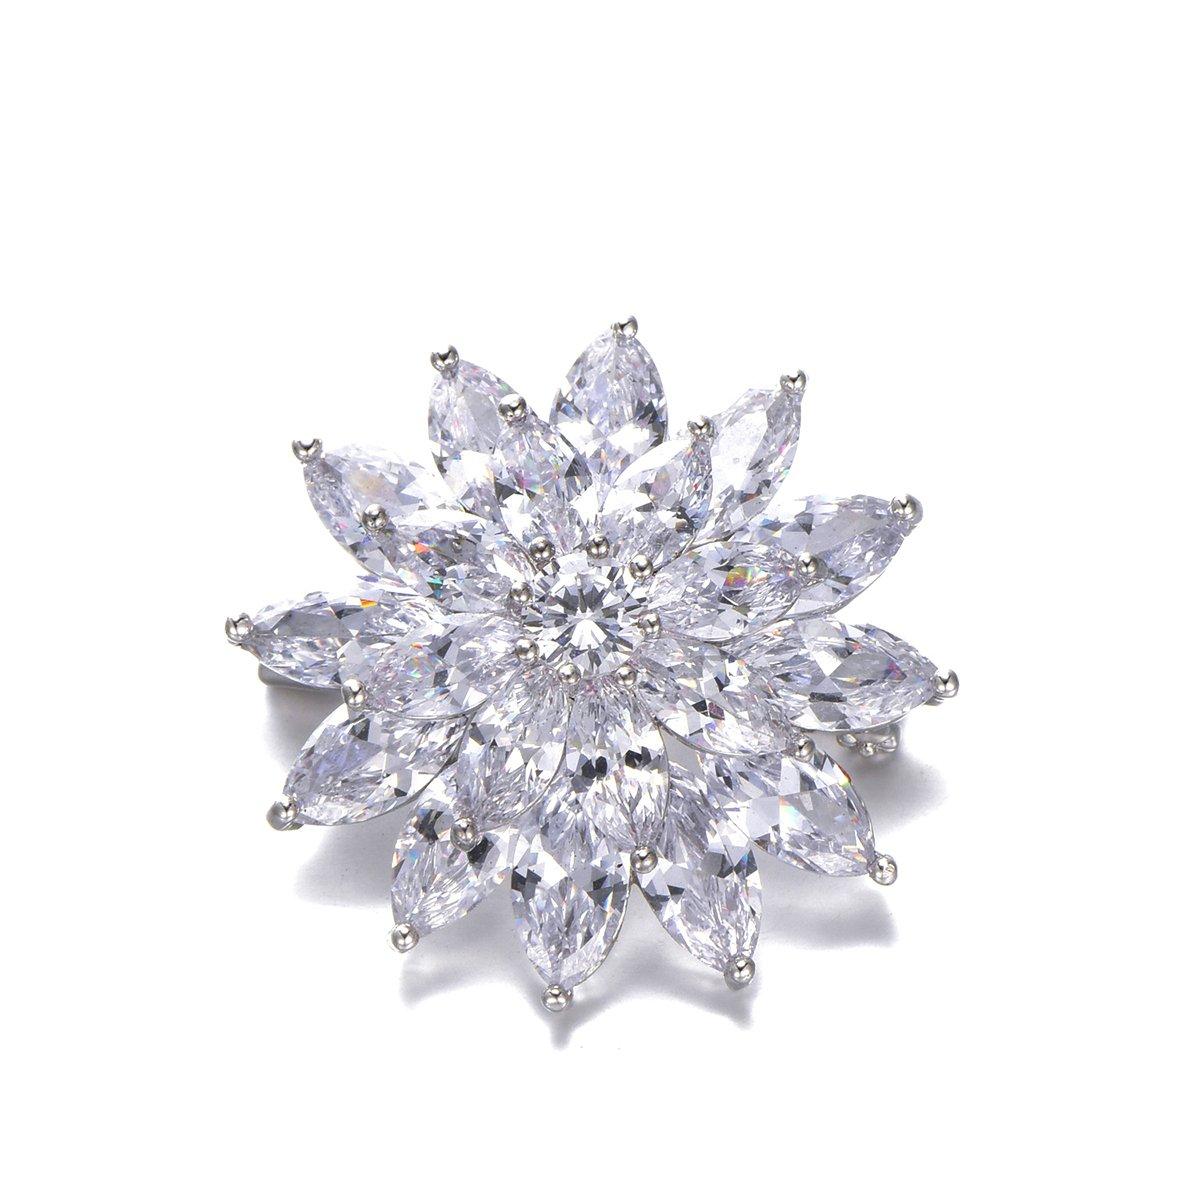 Flower Brooch Pins for Women,Dazzling Rhinestone Brooch for Brides Copper Vintage Crystal Brooch Girls